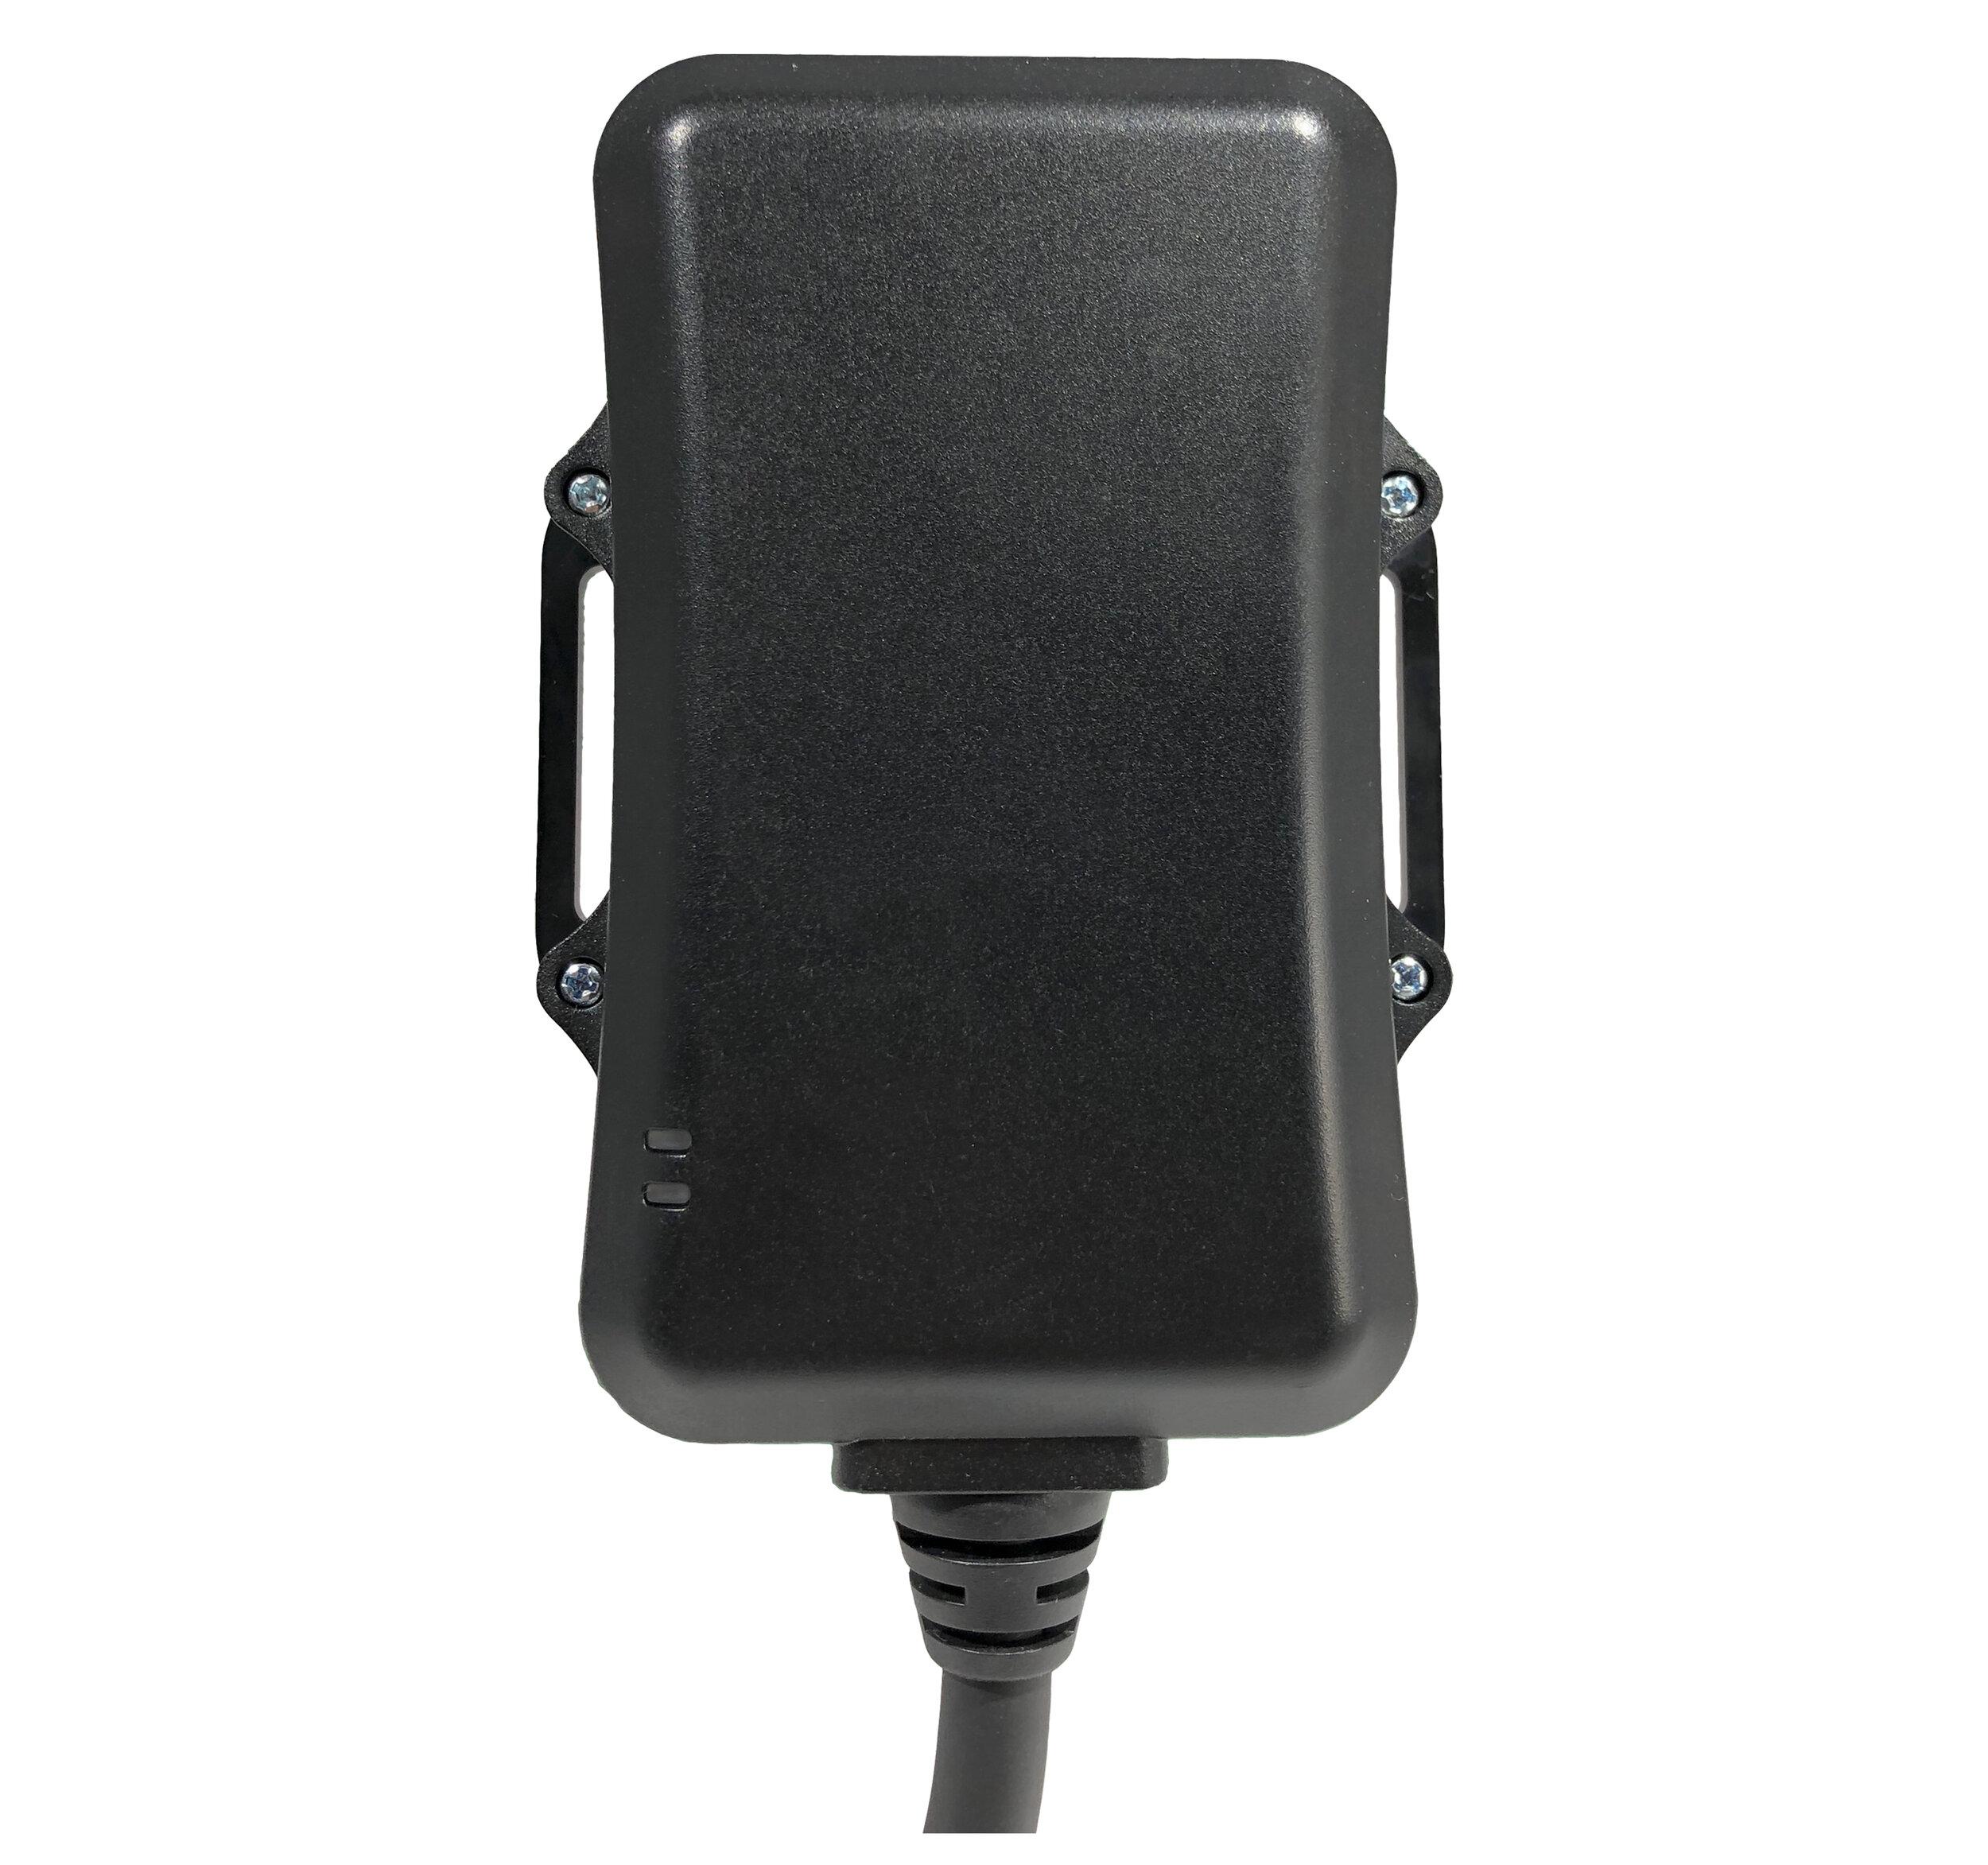 nms811 device img 1.jpg